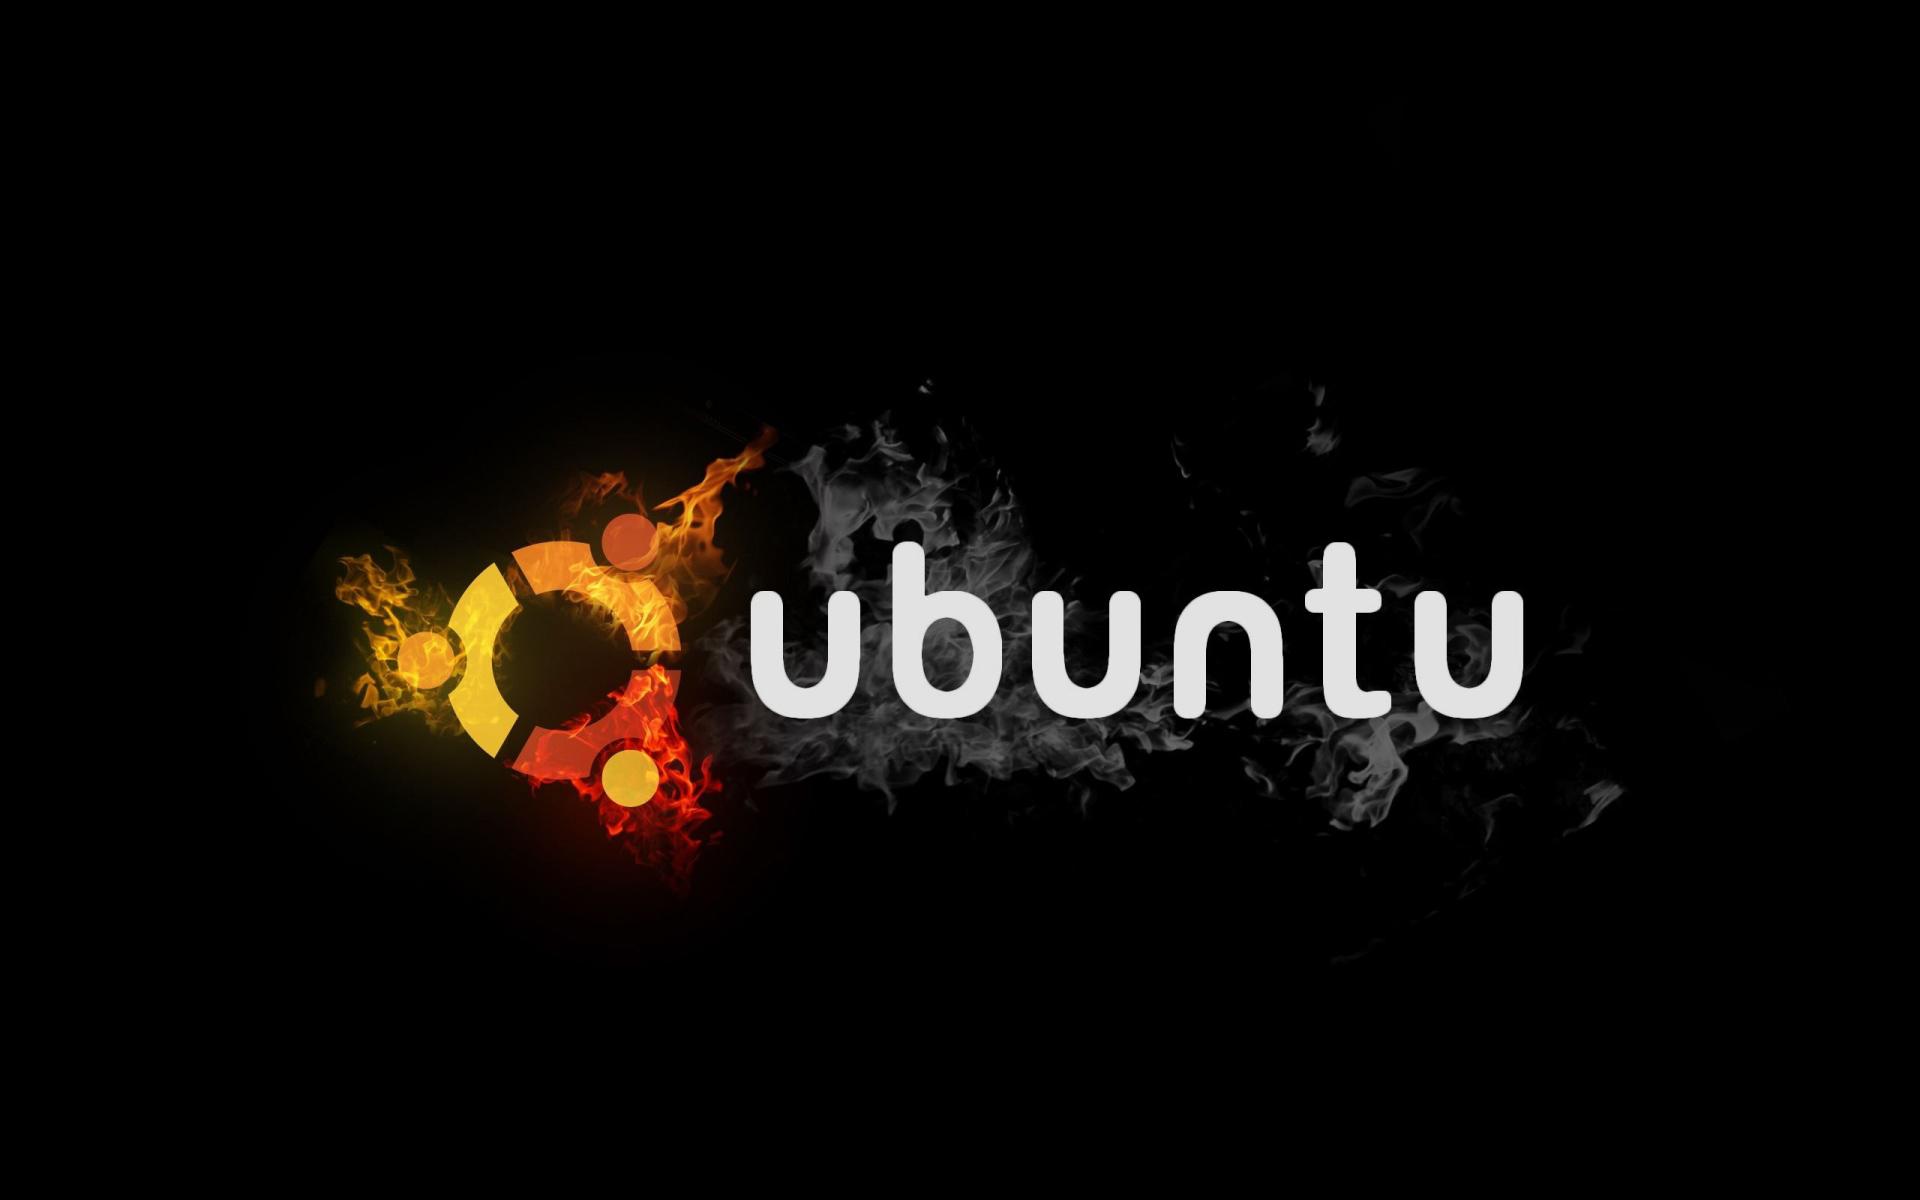 Ubuntu 1920x1200